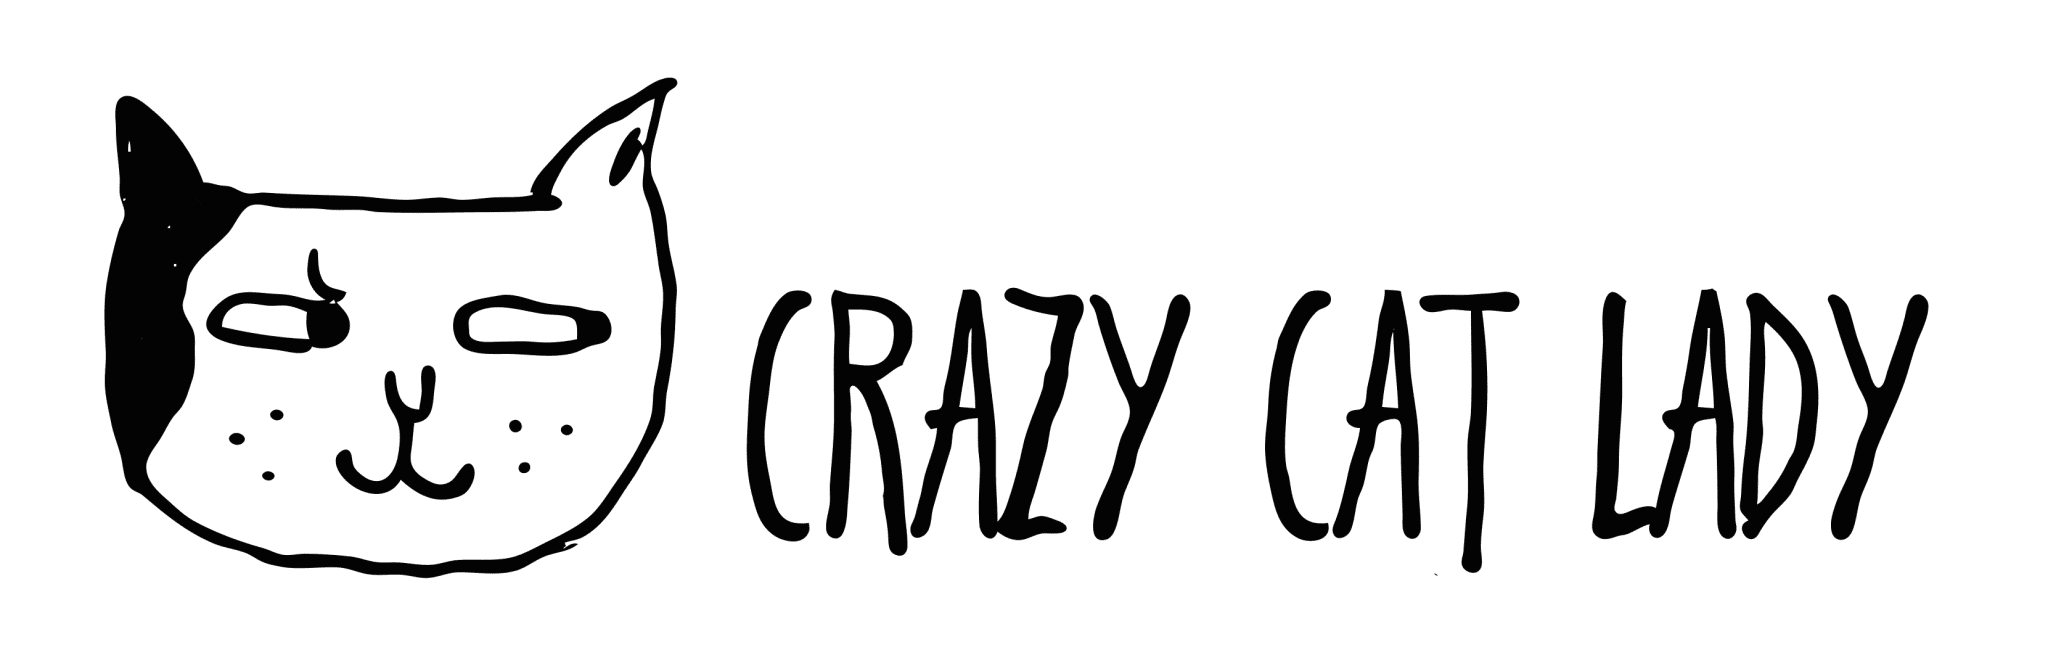 crazy cat lady memes-098